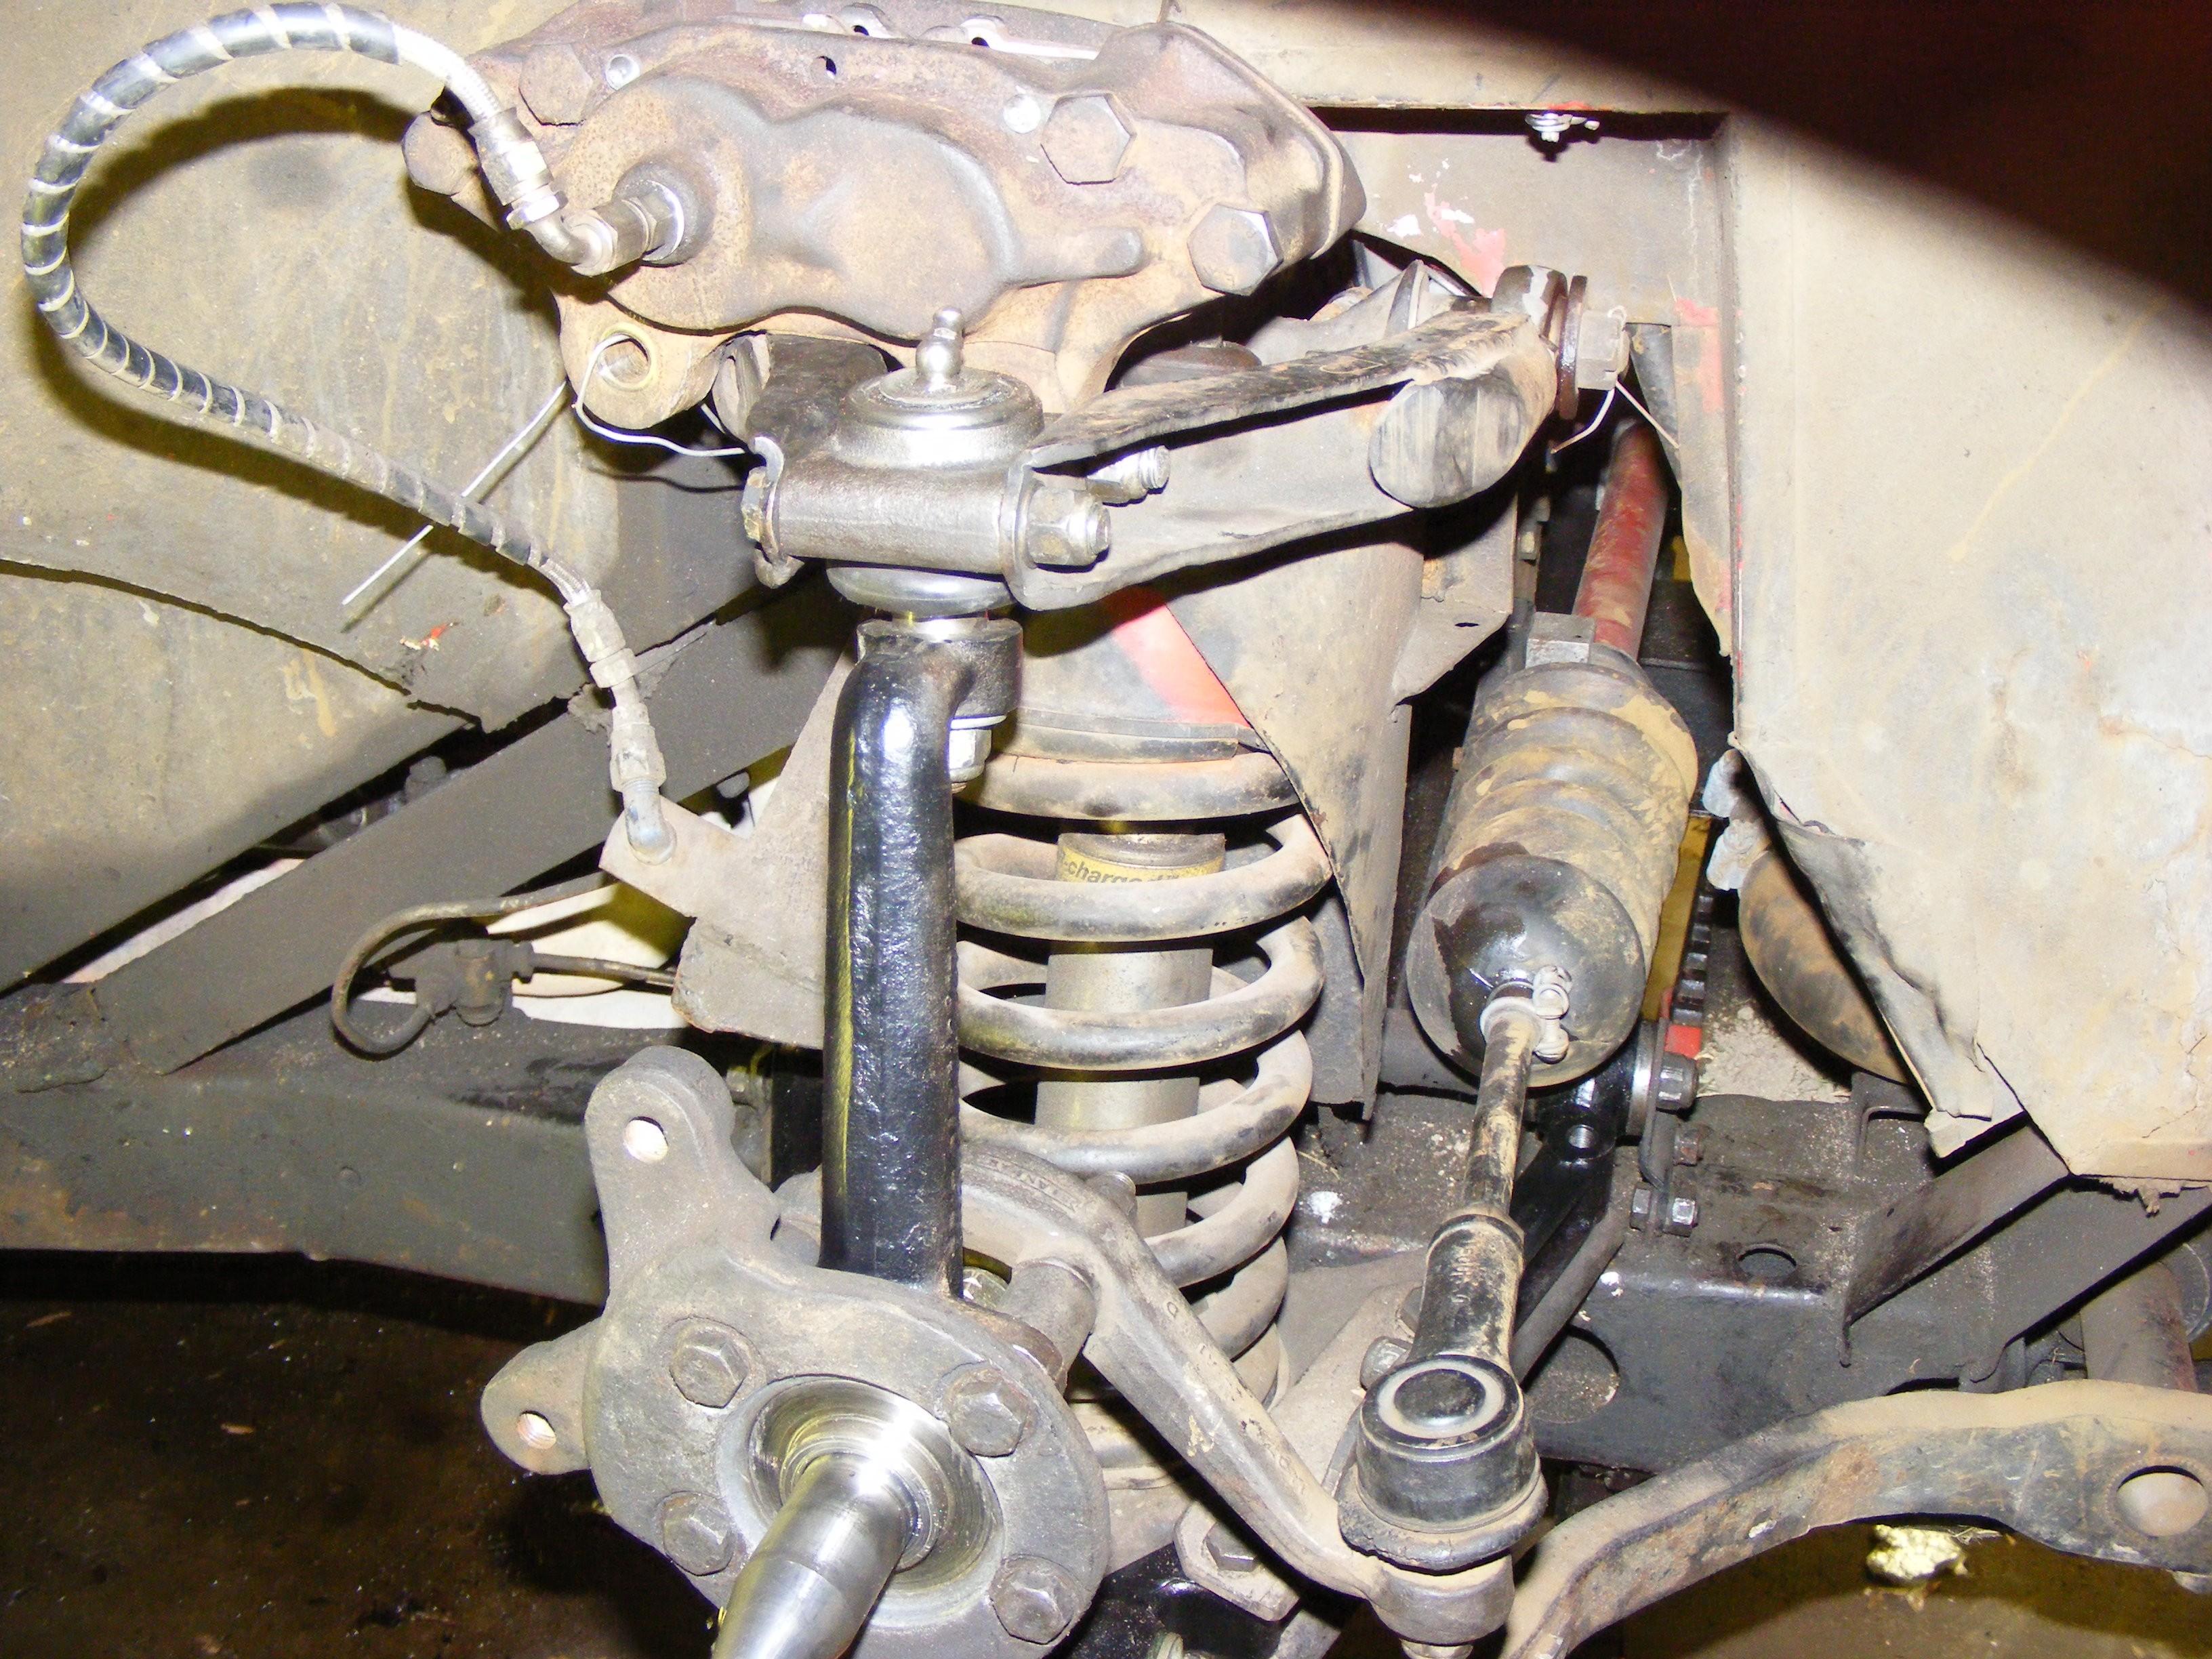 ba falcon trailer wiring diagram 63 chevy truck car front suspension essay replacing bf